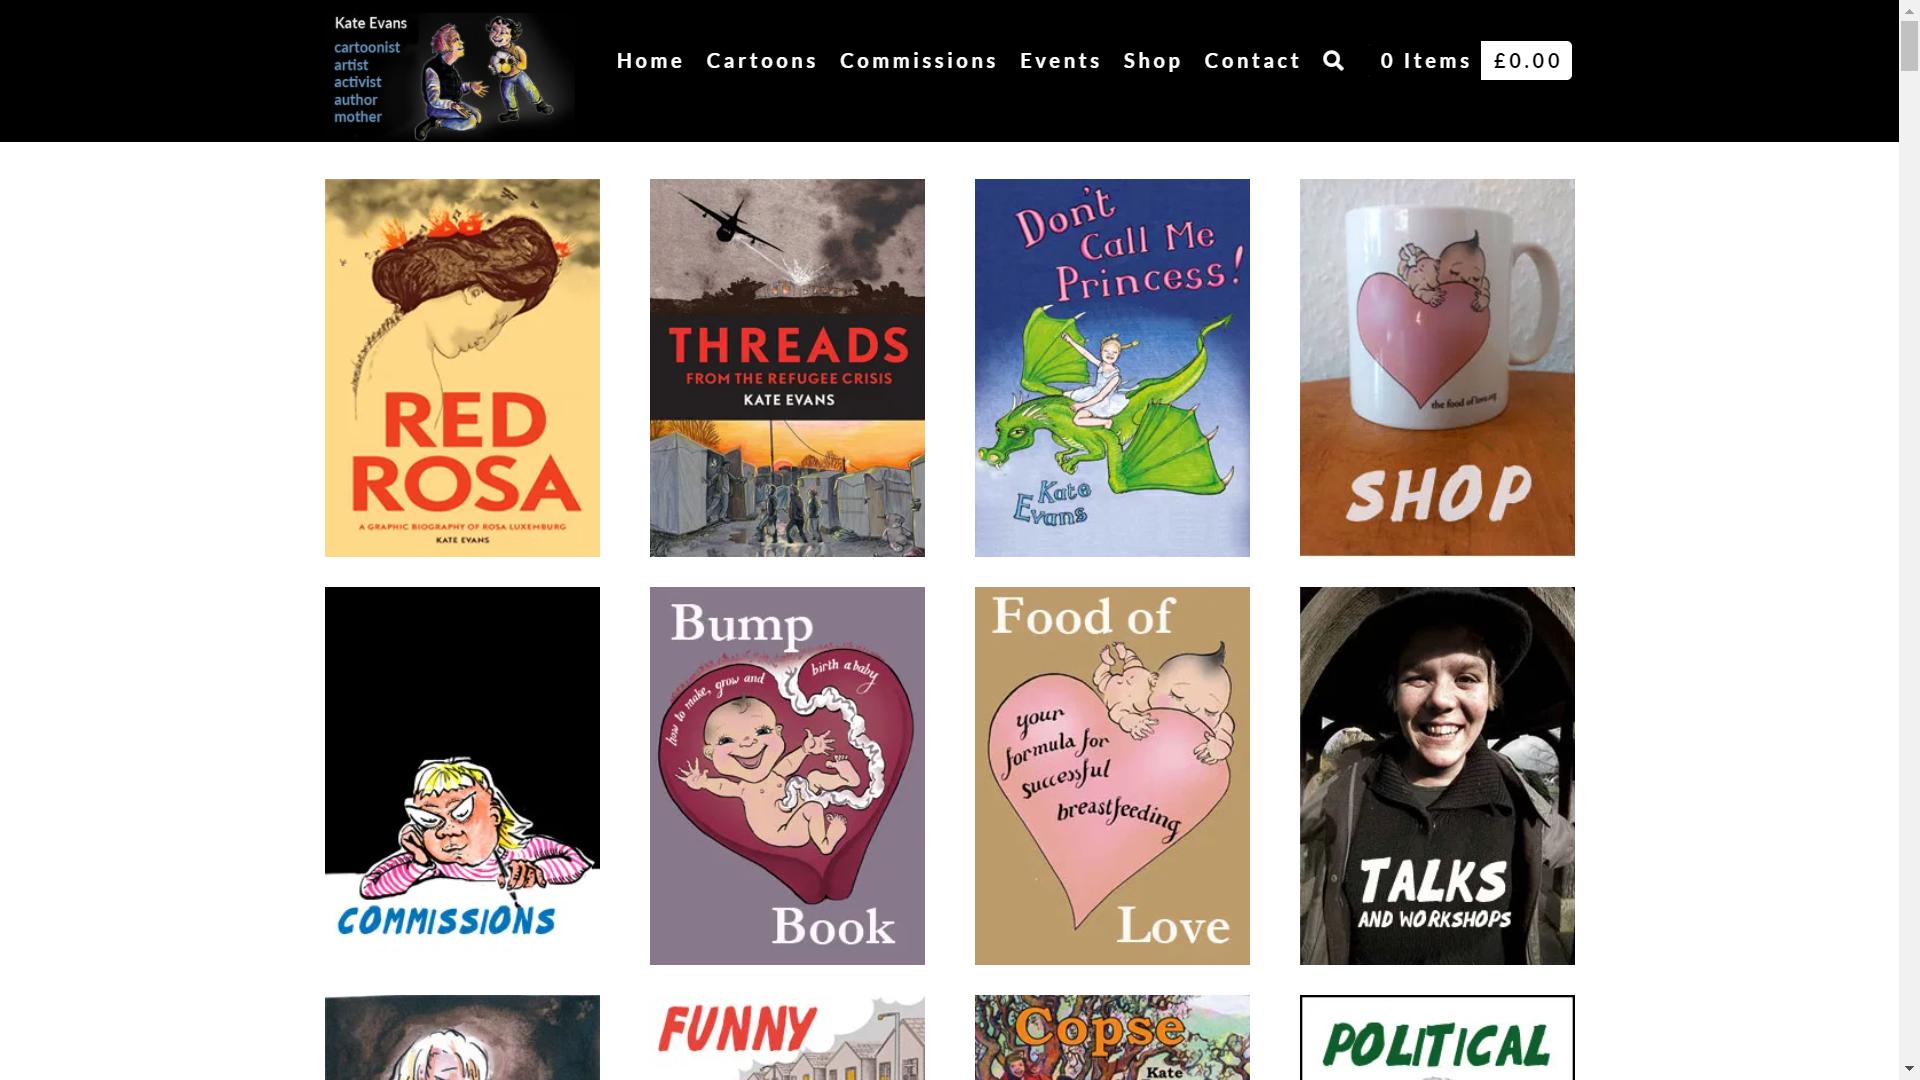 Cartoon Kate's website